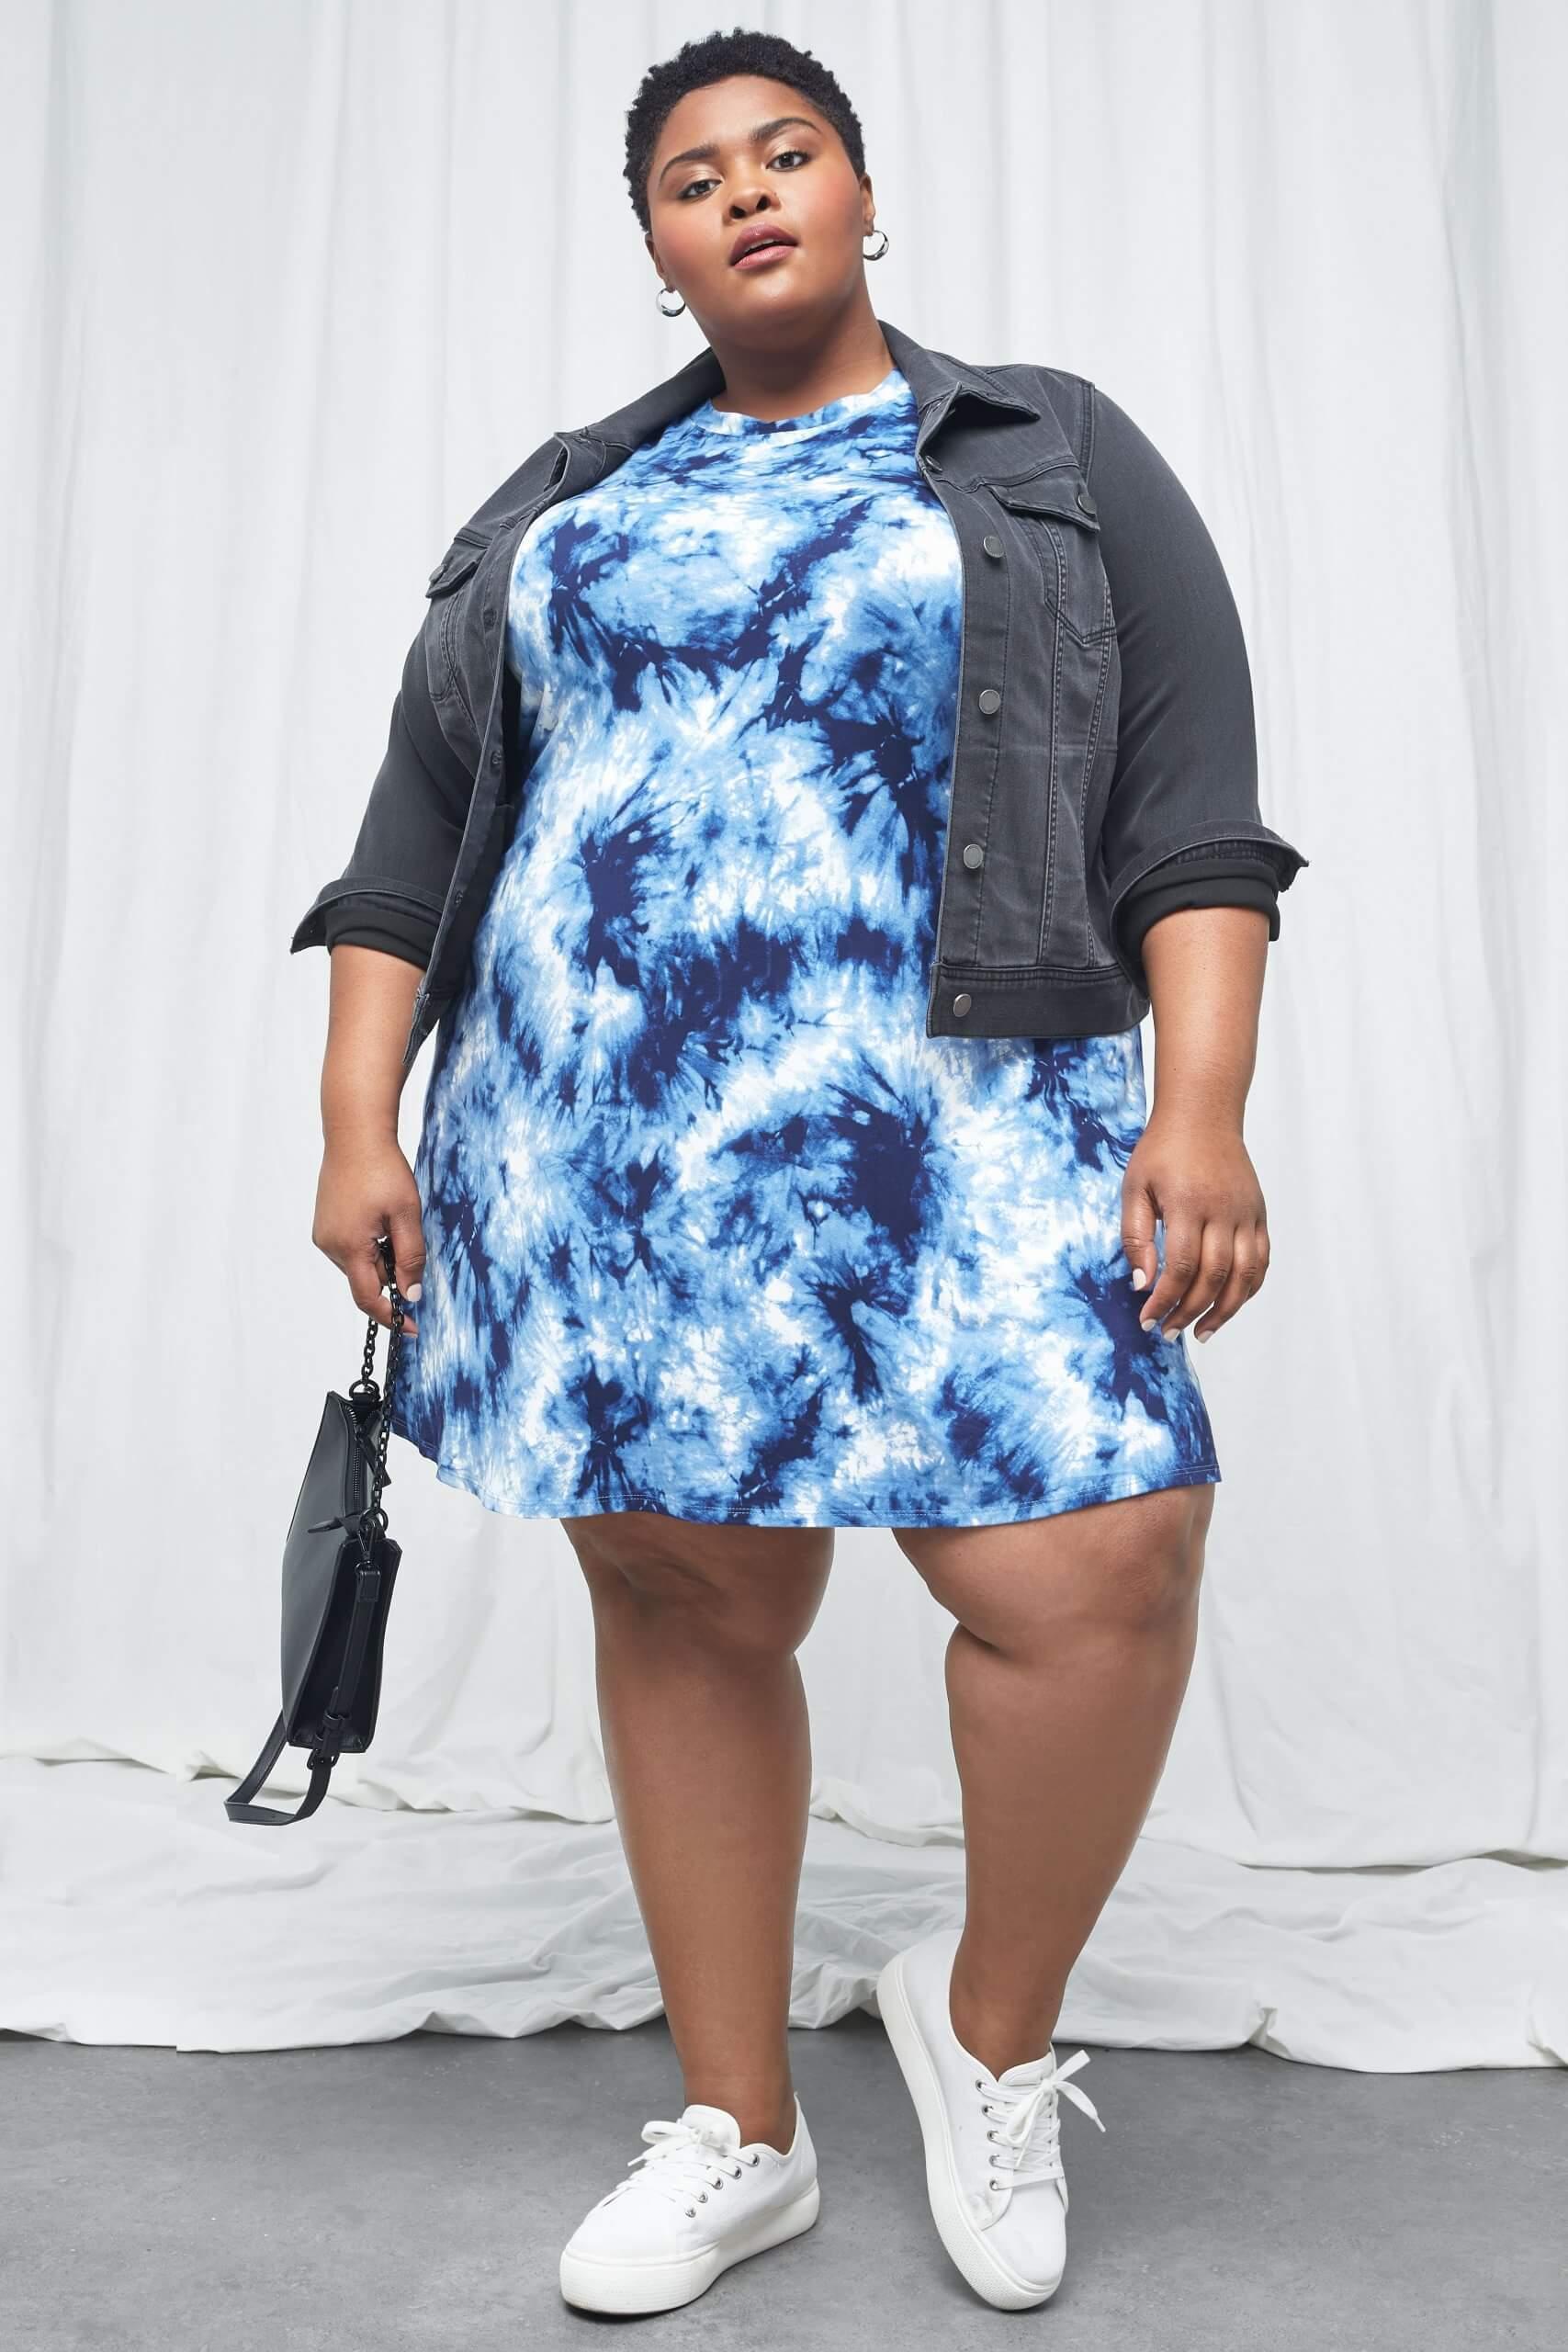 Stitch Fix Women's model wearing blue tie-dye knit dress with grey denim jacket and white sneakers, holding a black purse.